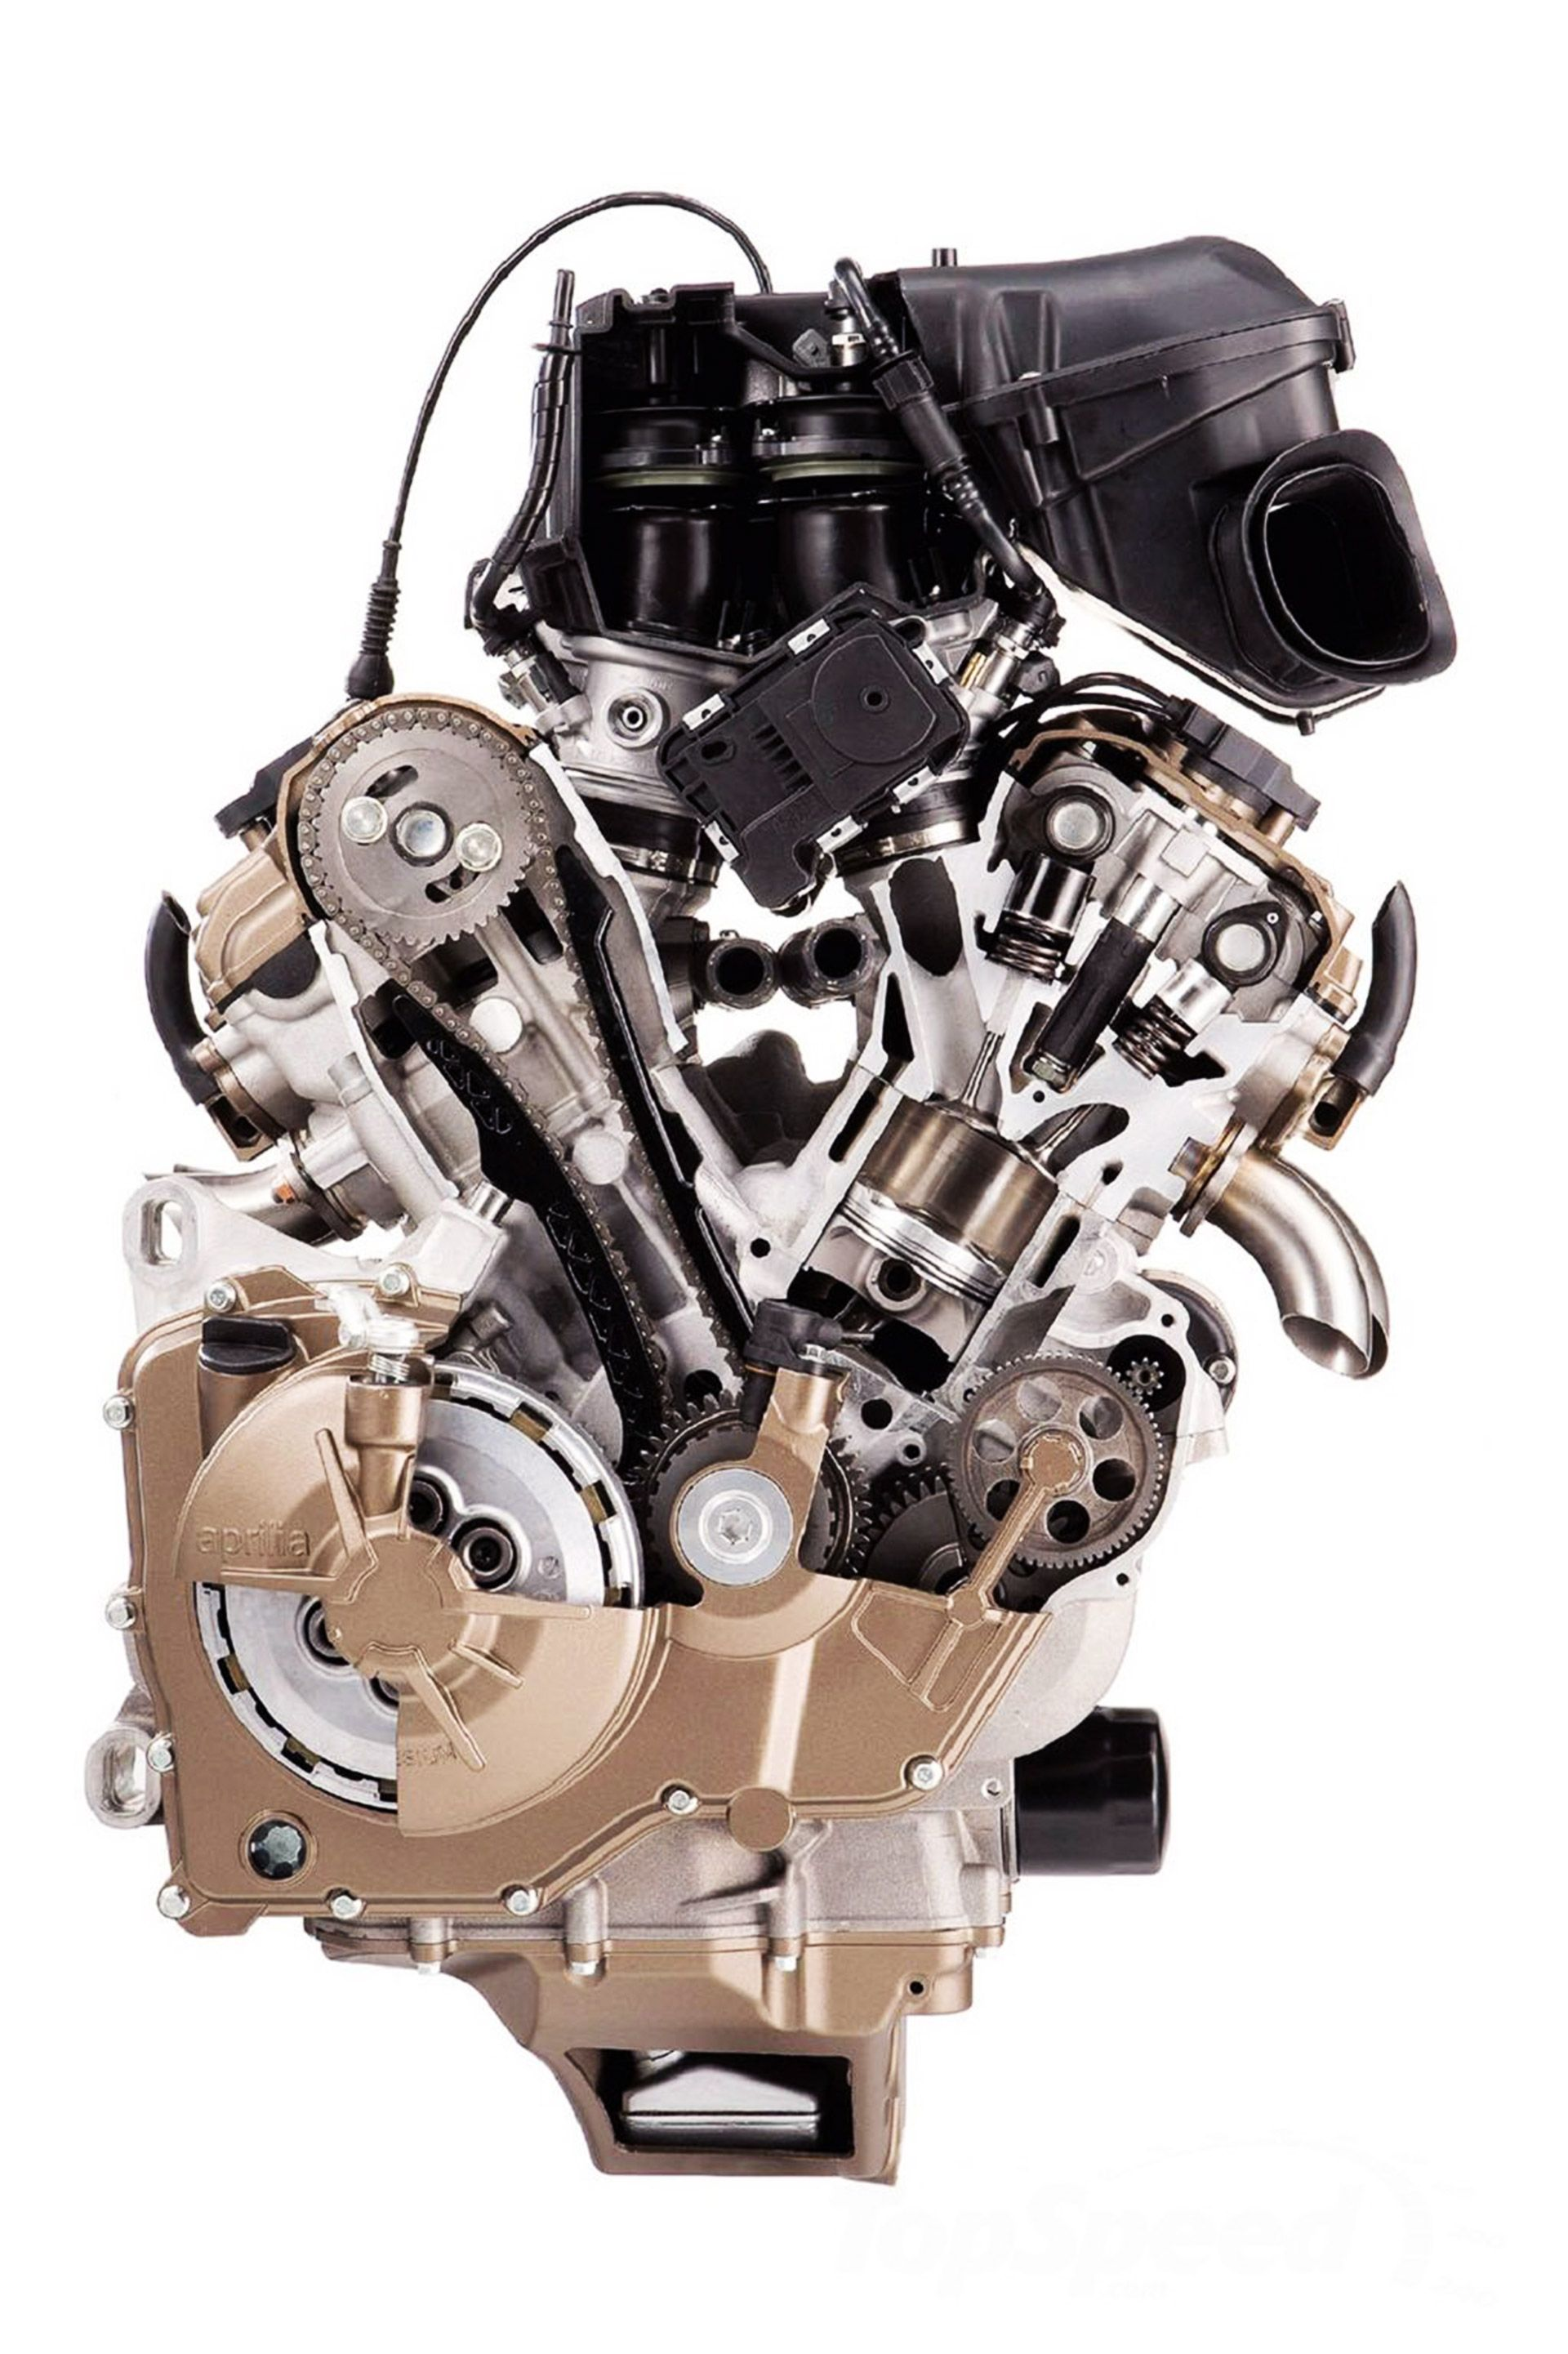 2012 ia rsv4 factory aprc engine specs car review engine · 2012 ia rsv4 factory aprc engine specs